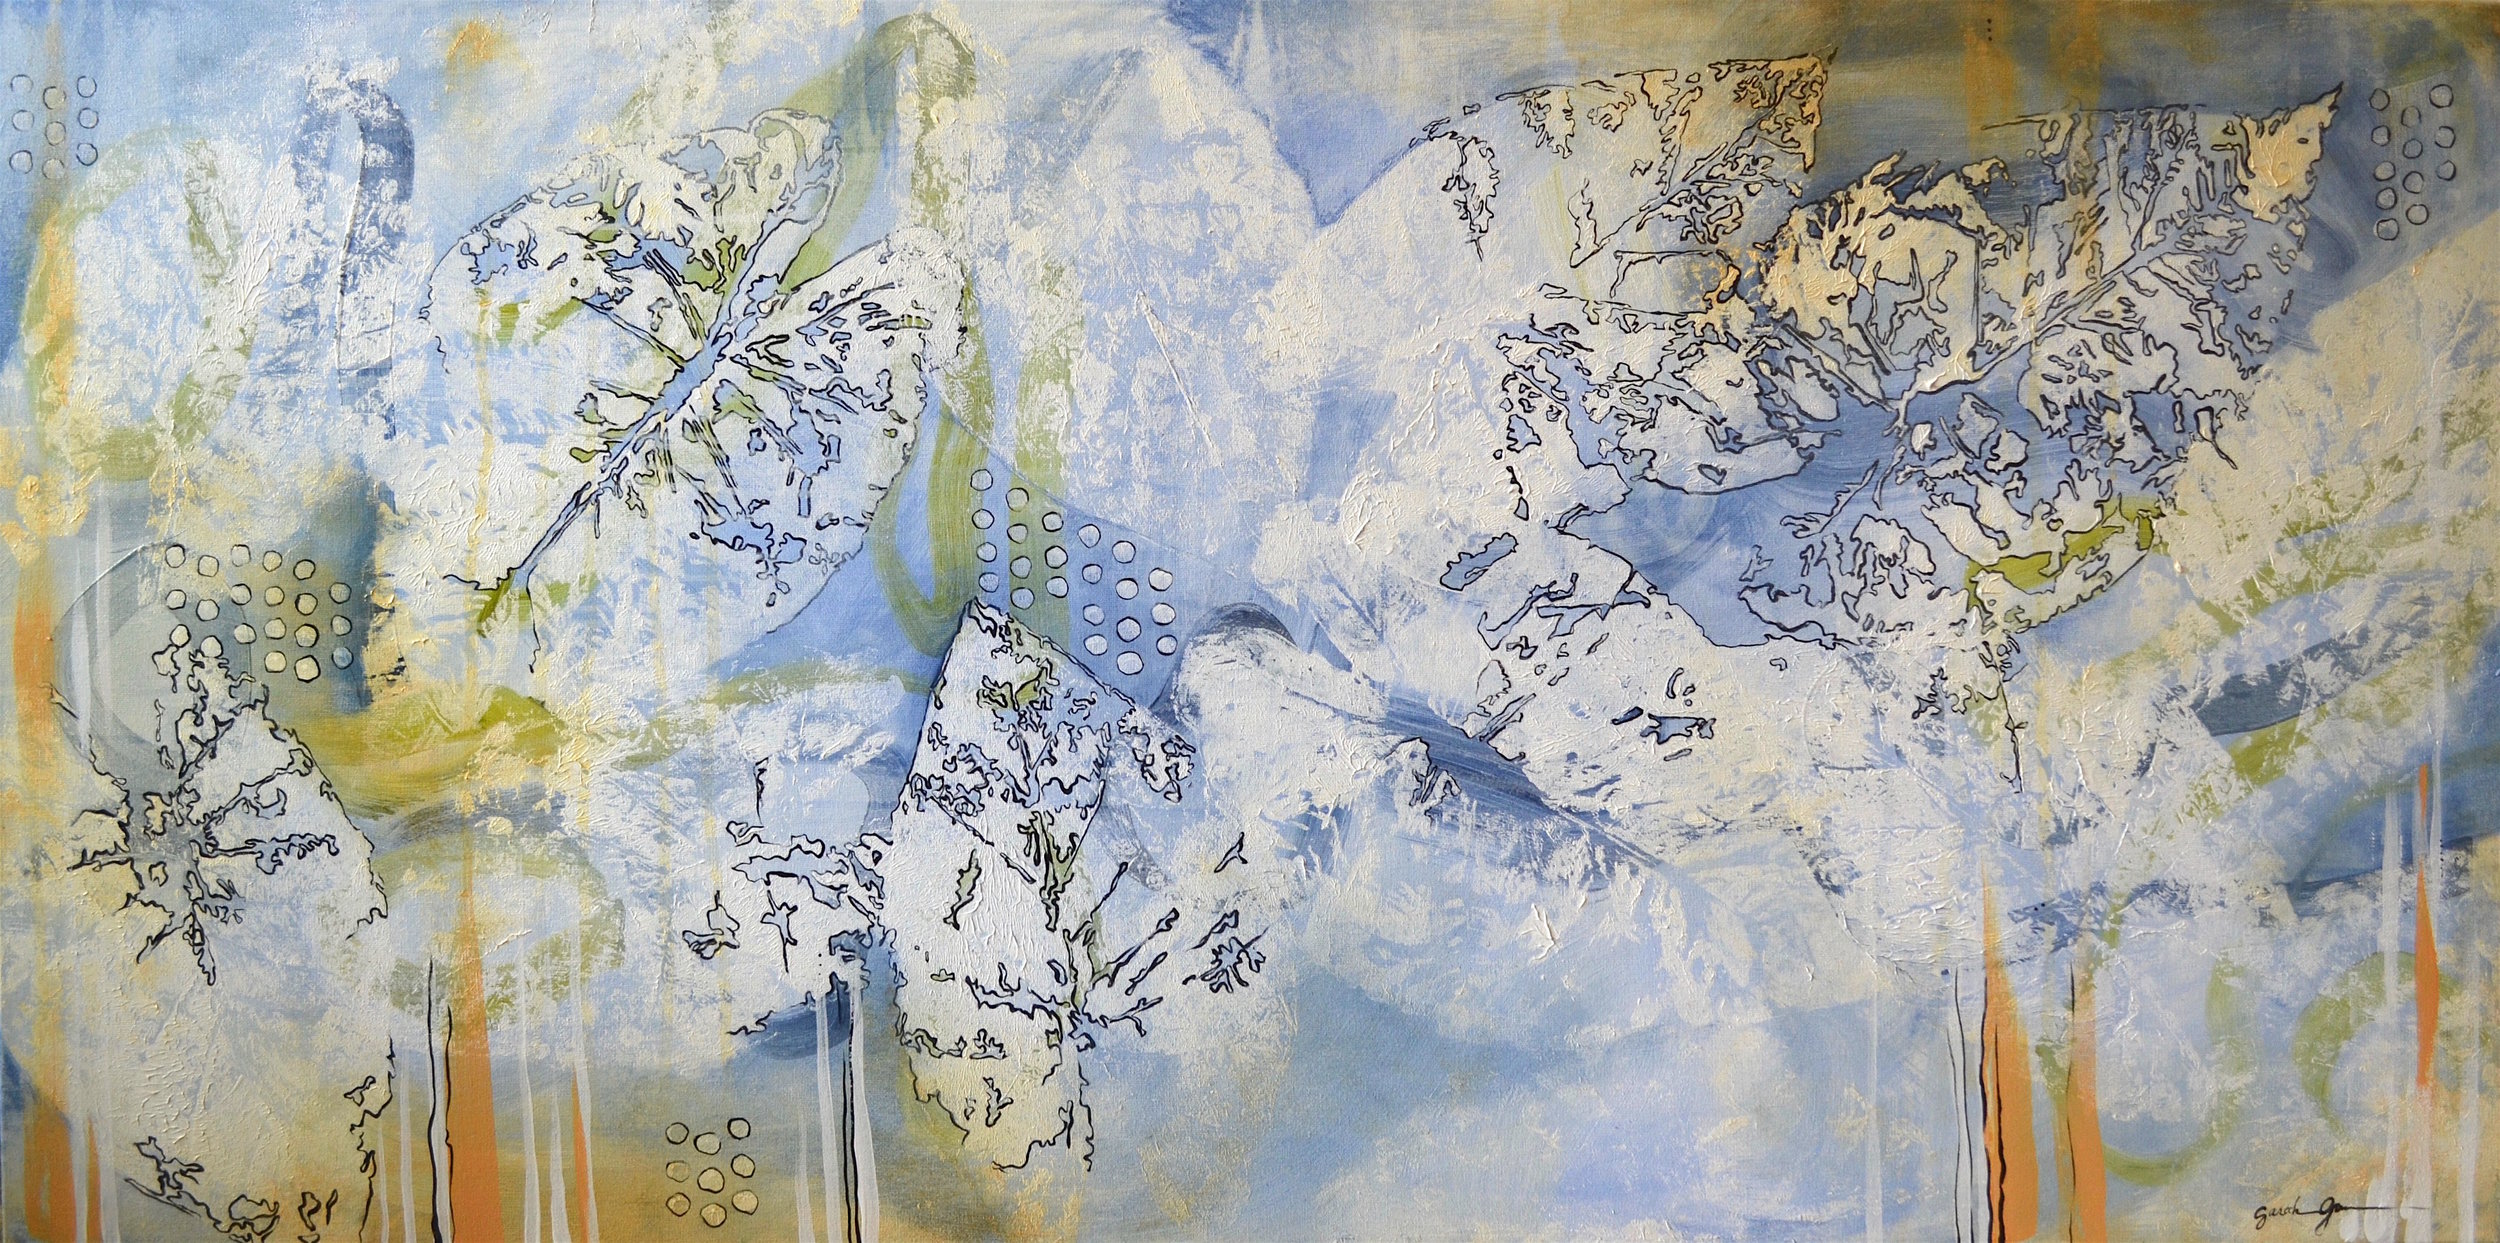 Dappled Things  | 24 x 48 inch acrylic on canvas